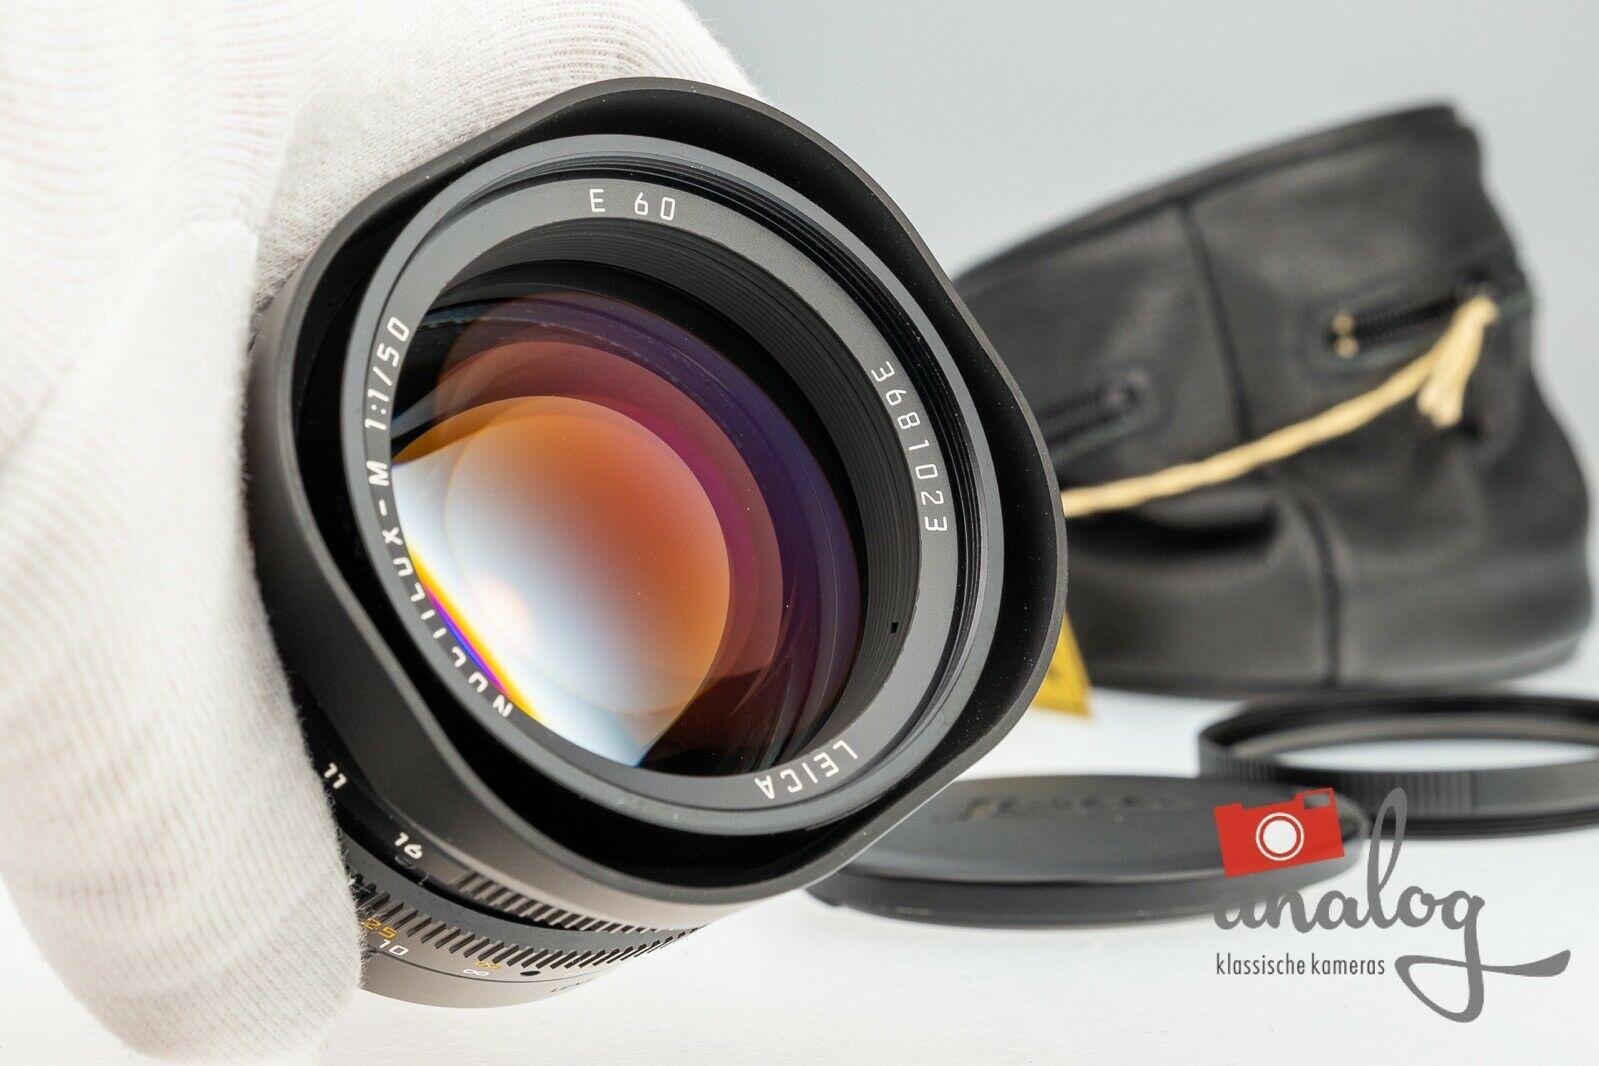 Leica M Noctilux 50mm 1.0 E60 - 4th - 11822 | Leica-Service und 6Bit | Sonderpreis